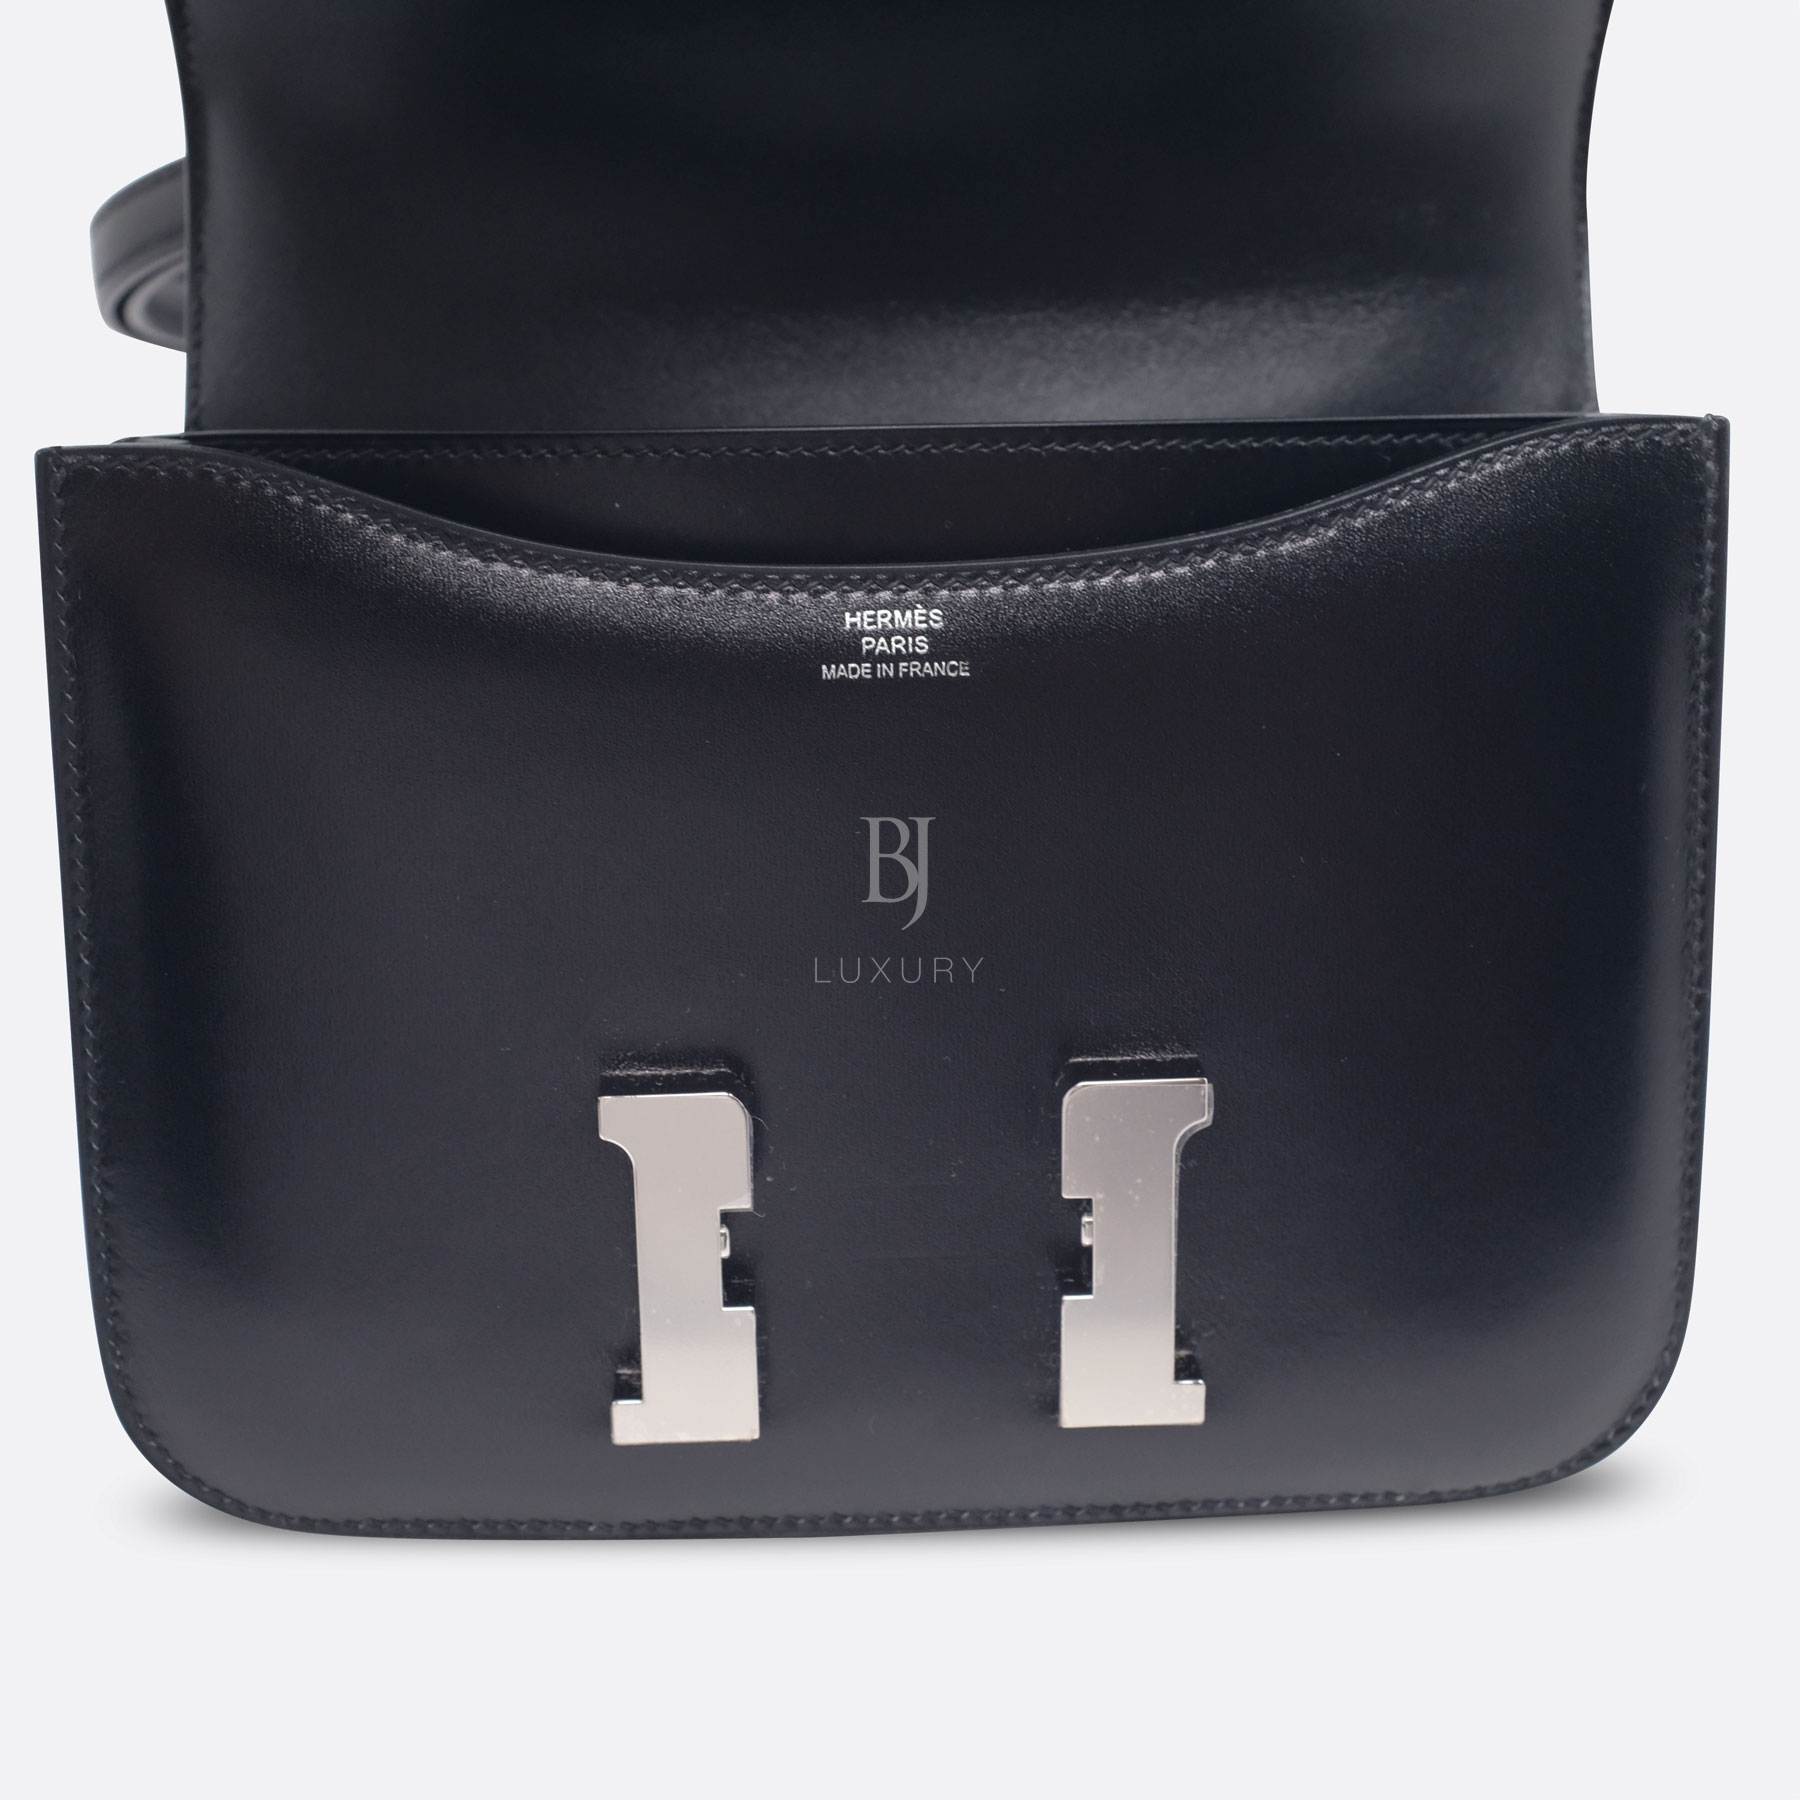 HERMES-CONSTANCE-18-BLACK-BOXCALF-DSCF8780.jpg